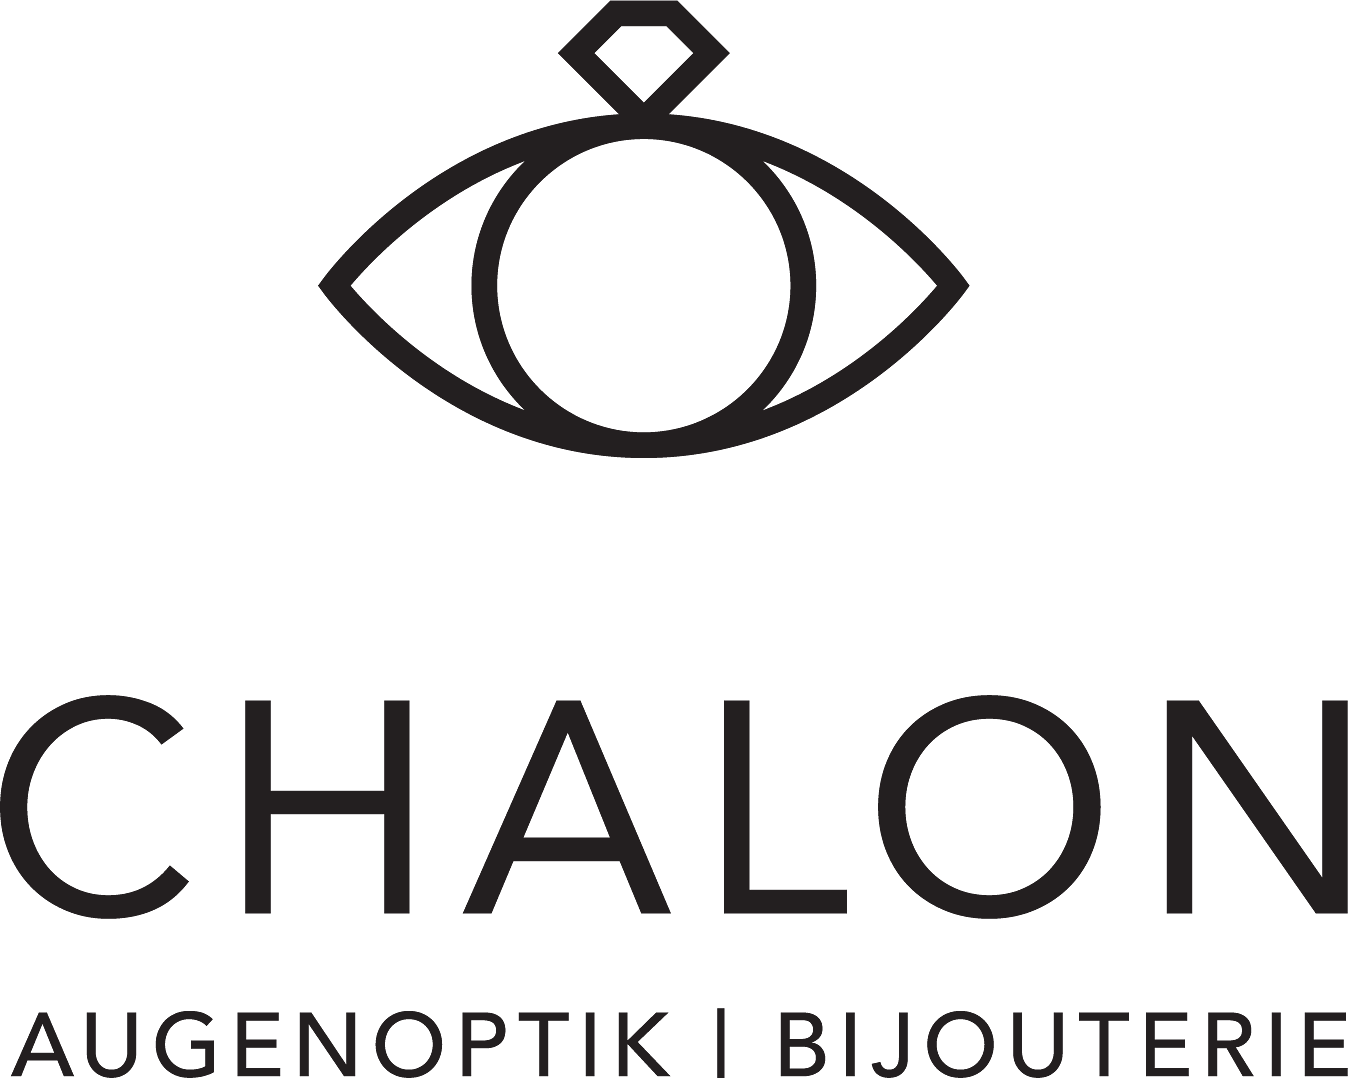 CHALON AG Augenoptik & Bijouterie